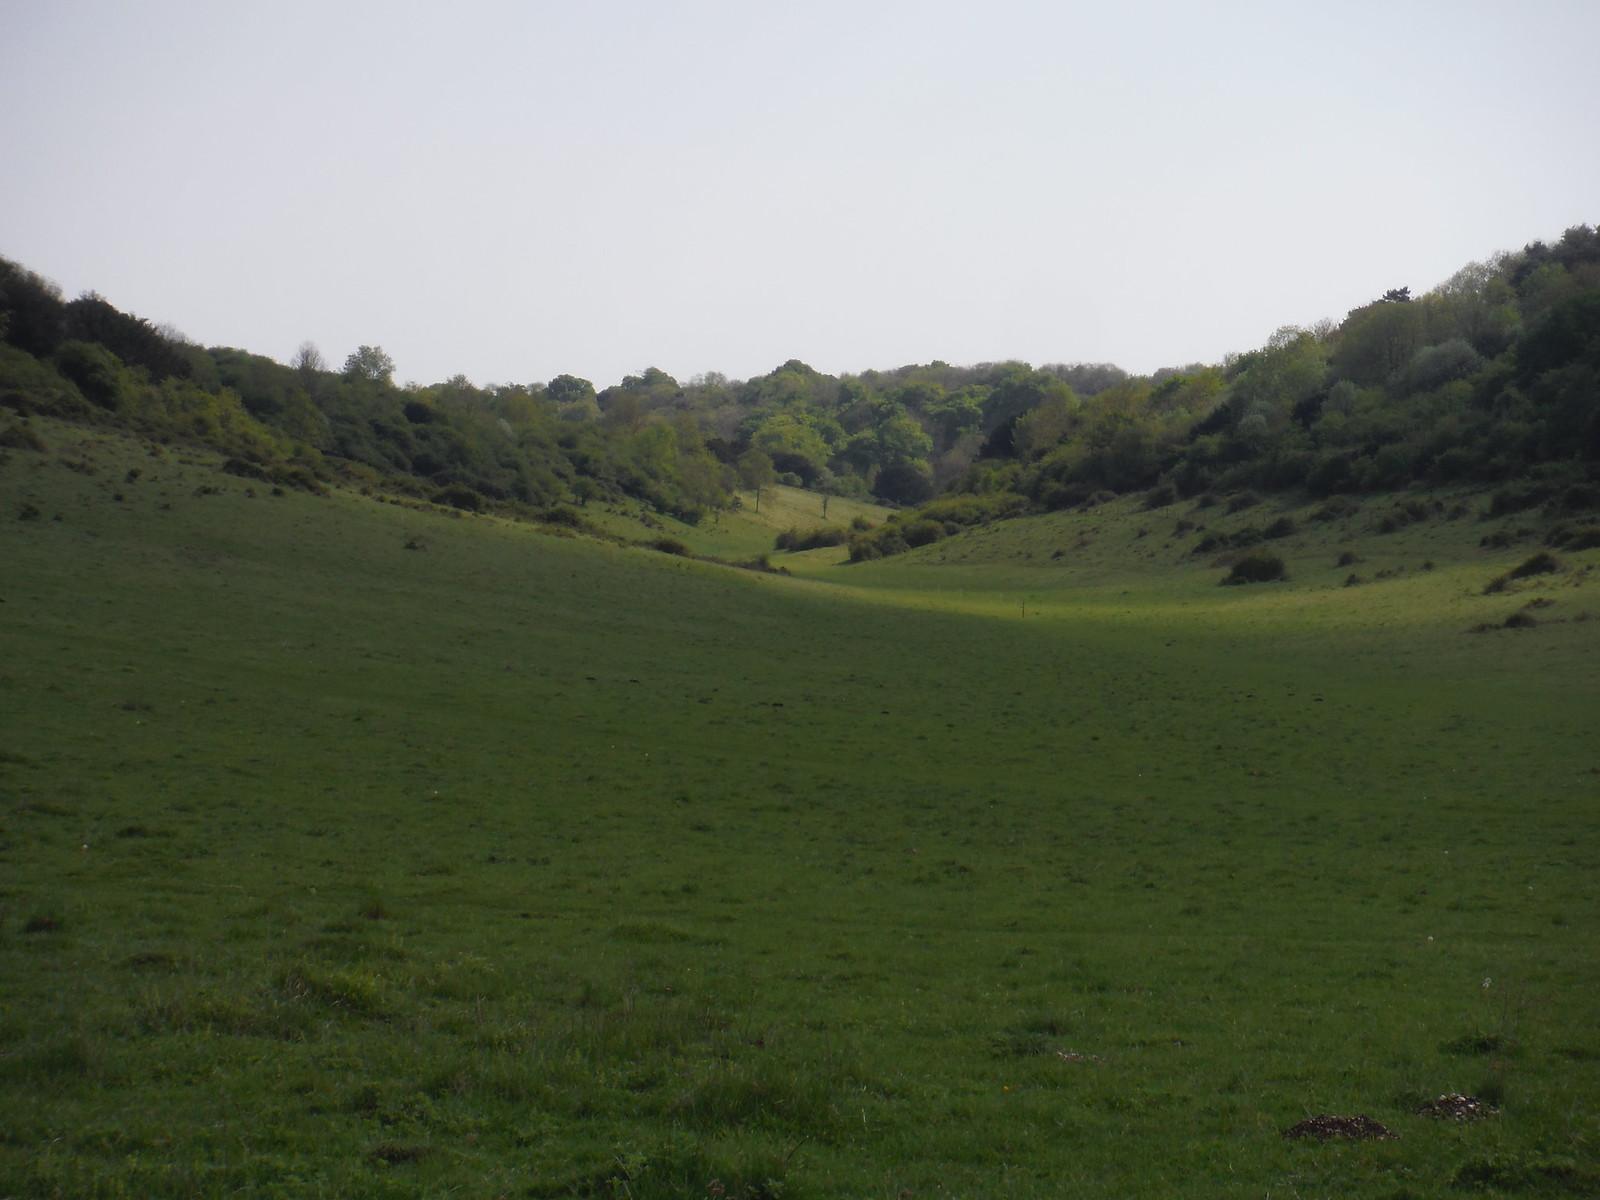 Bramshott Bottom SWC Walk Rowlands Castle Circular - Extension